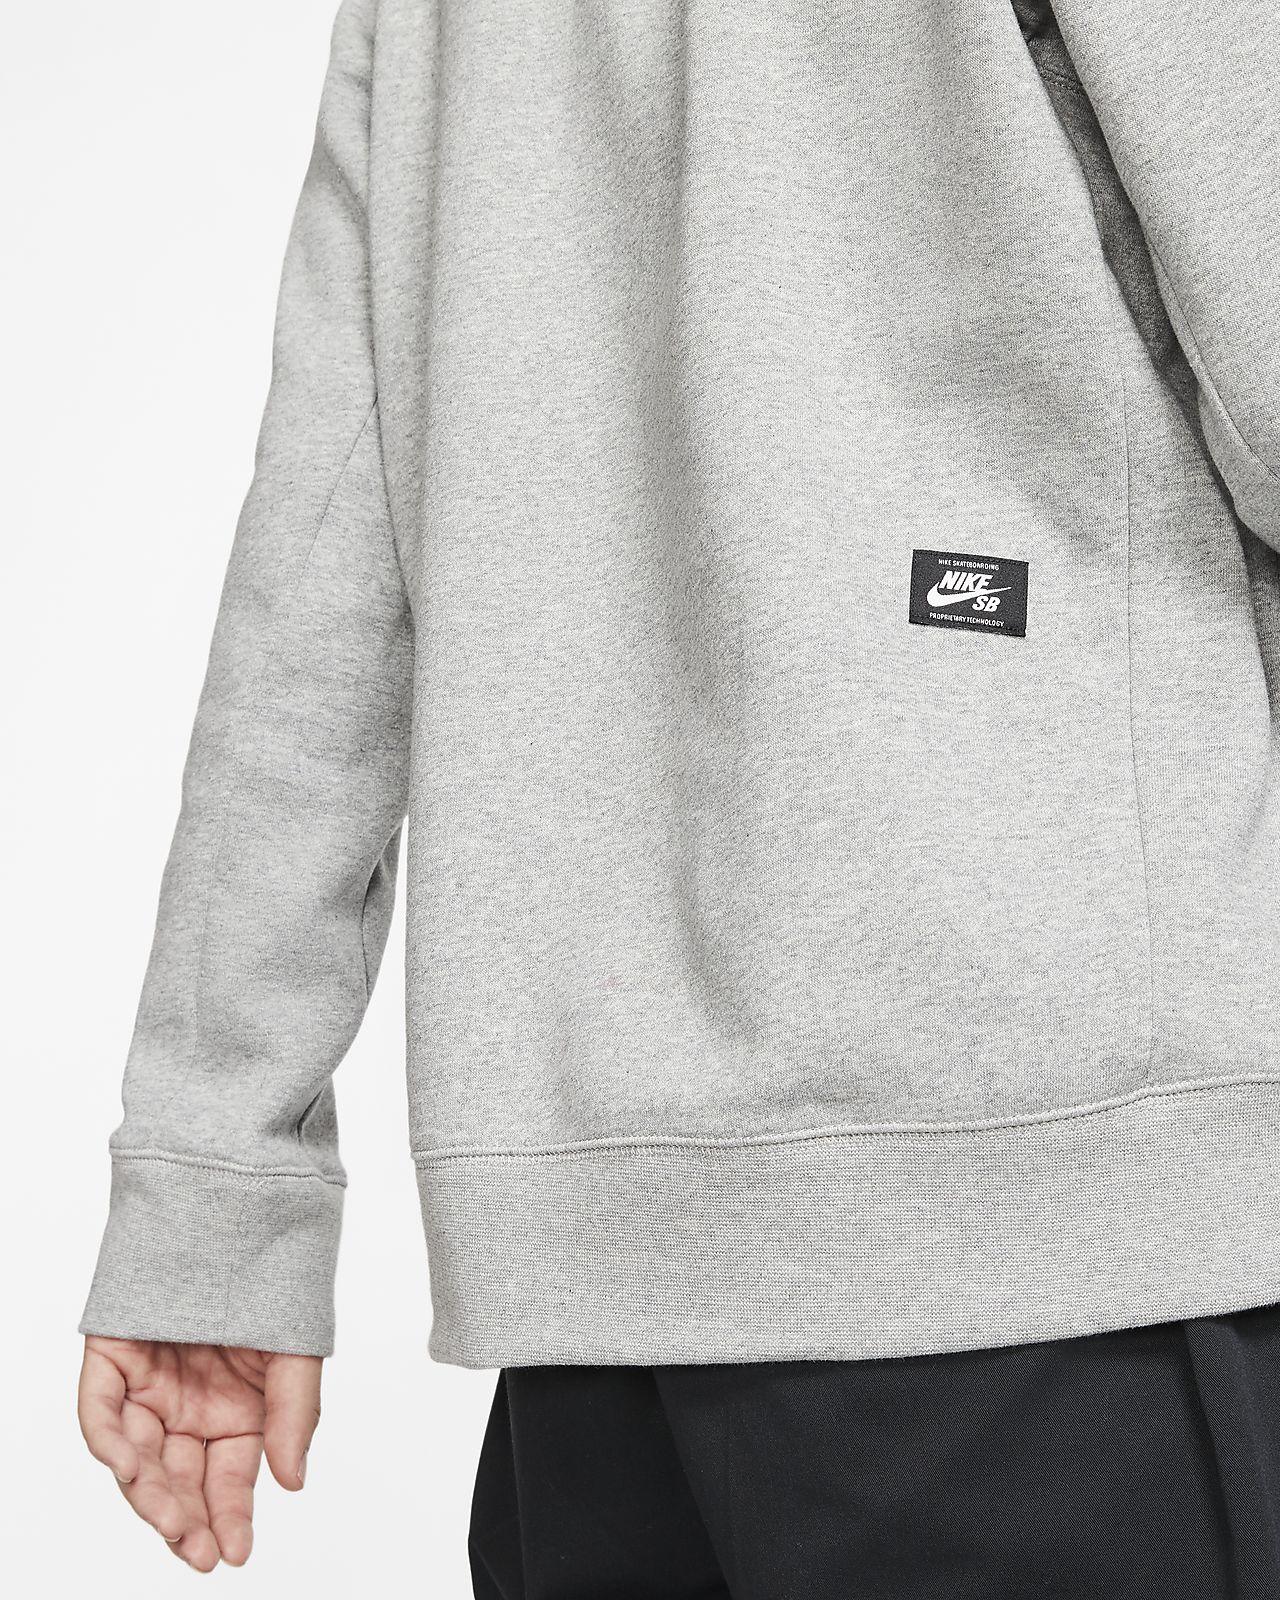 Nike Hoodie Herren Ebay BritishTown Yabancı Dil Kursu